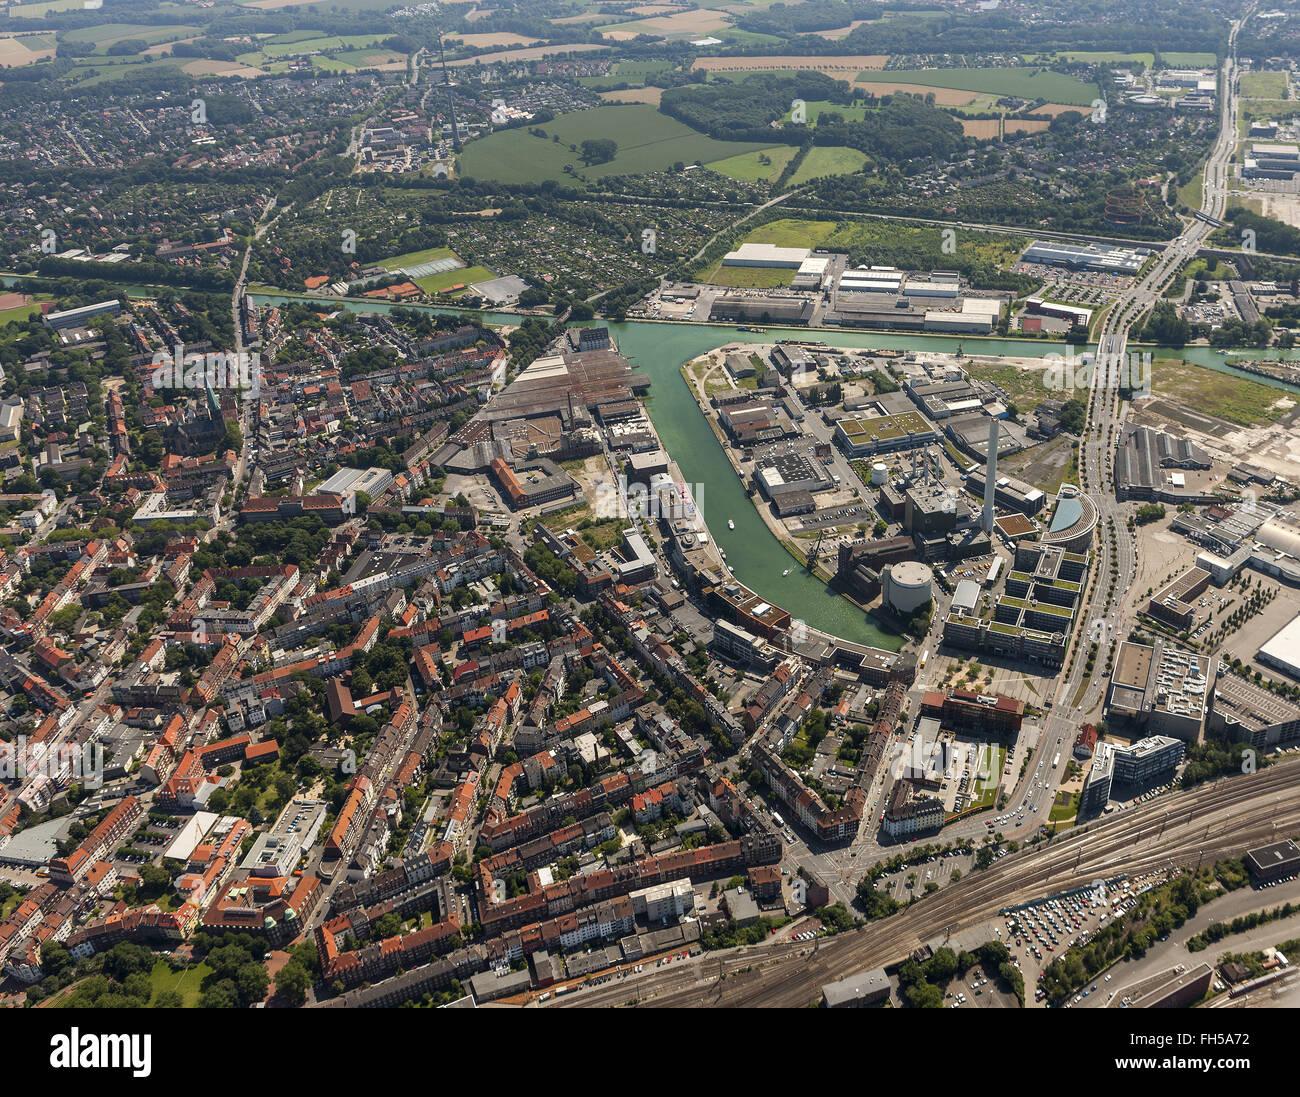 Aerial view, Münster Harbour, Dortmund-Ems Canal, Münster, Münsterland countryside, North Rhine-Westphalia, - Stock Image